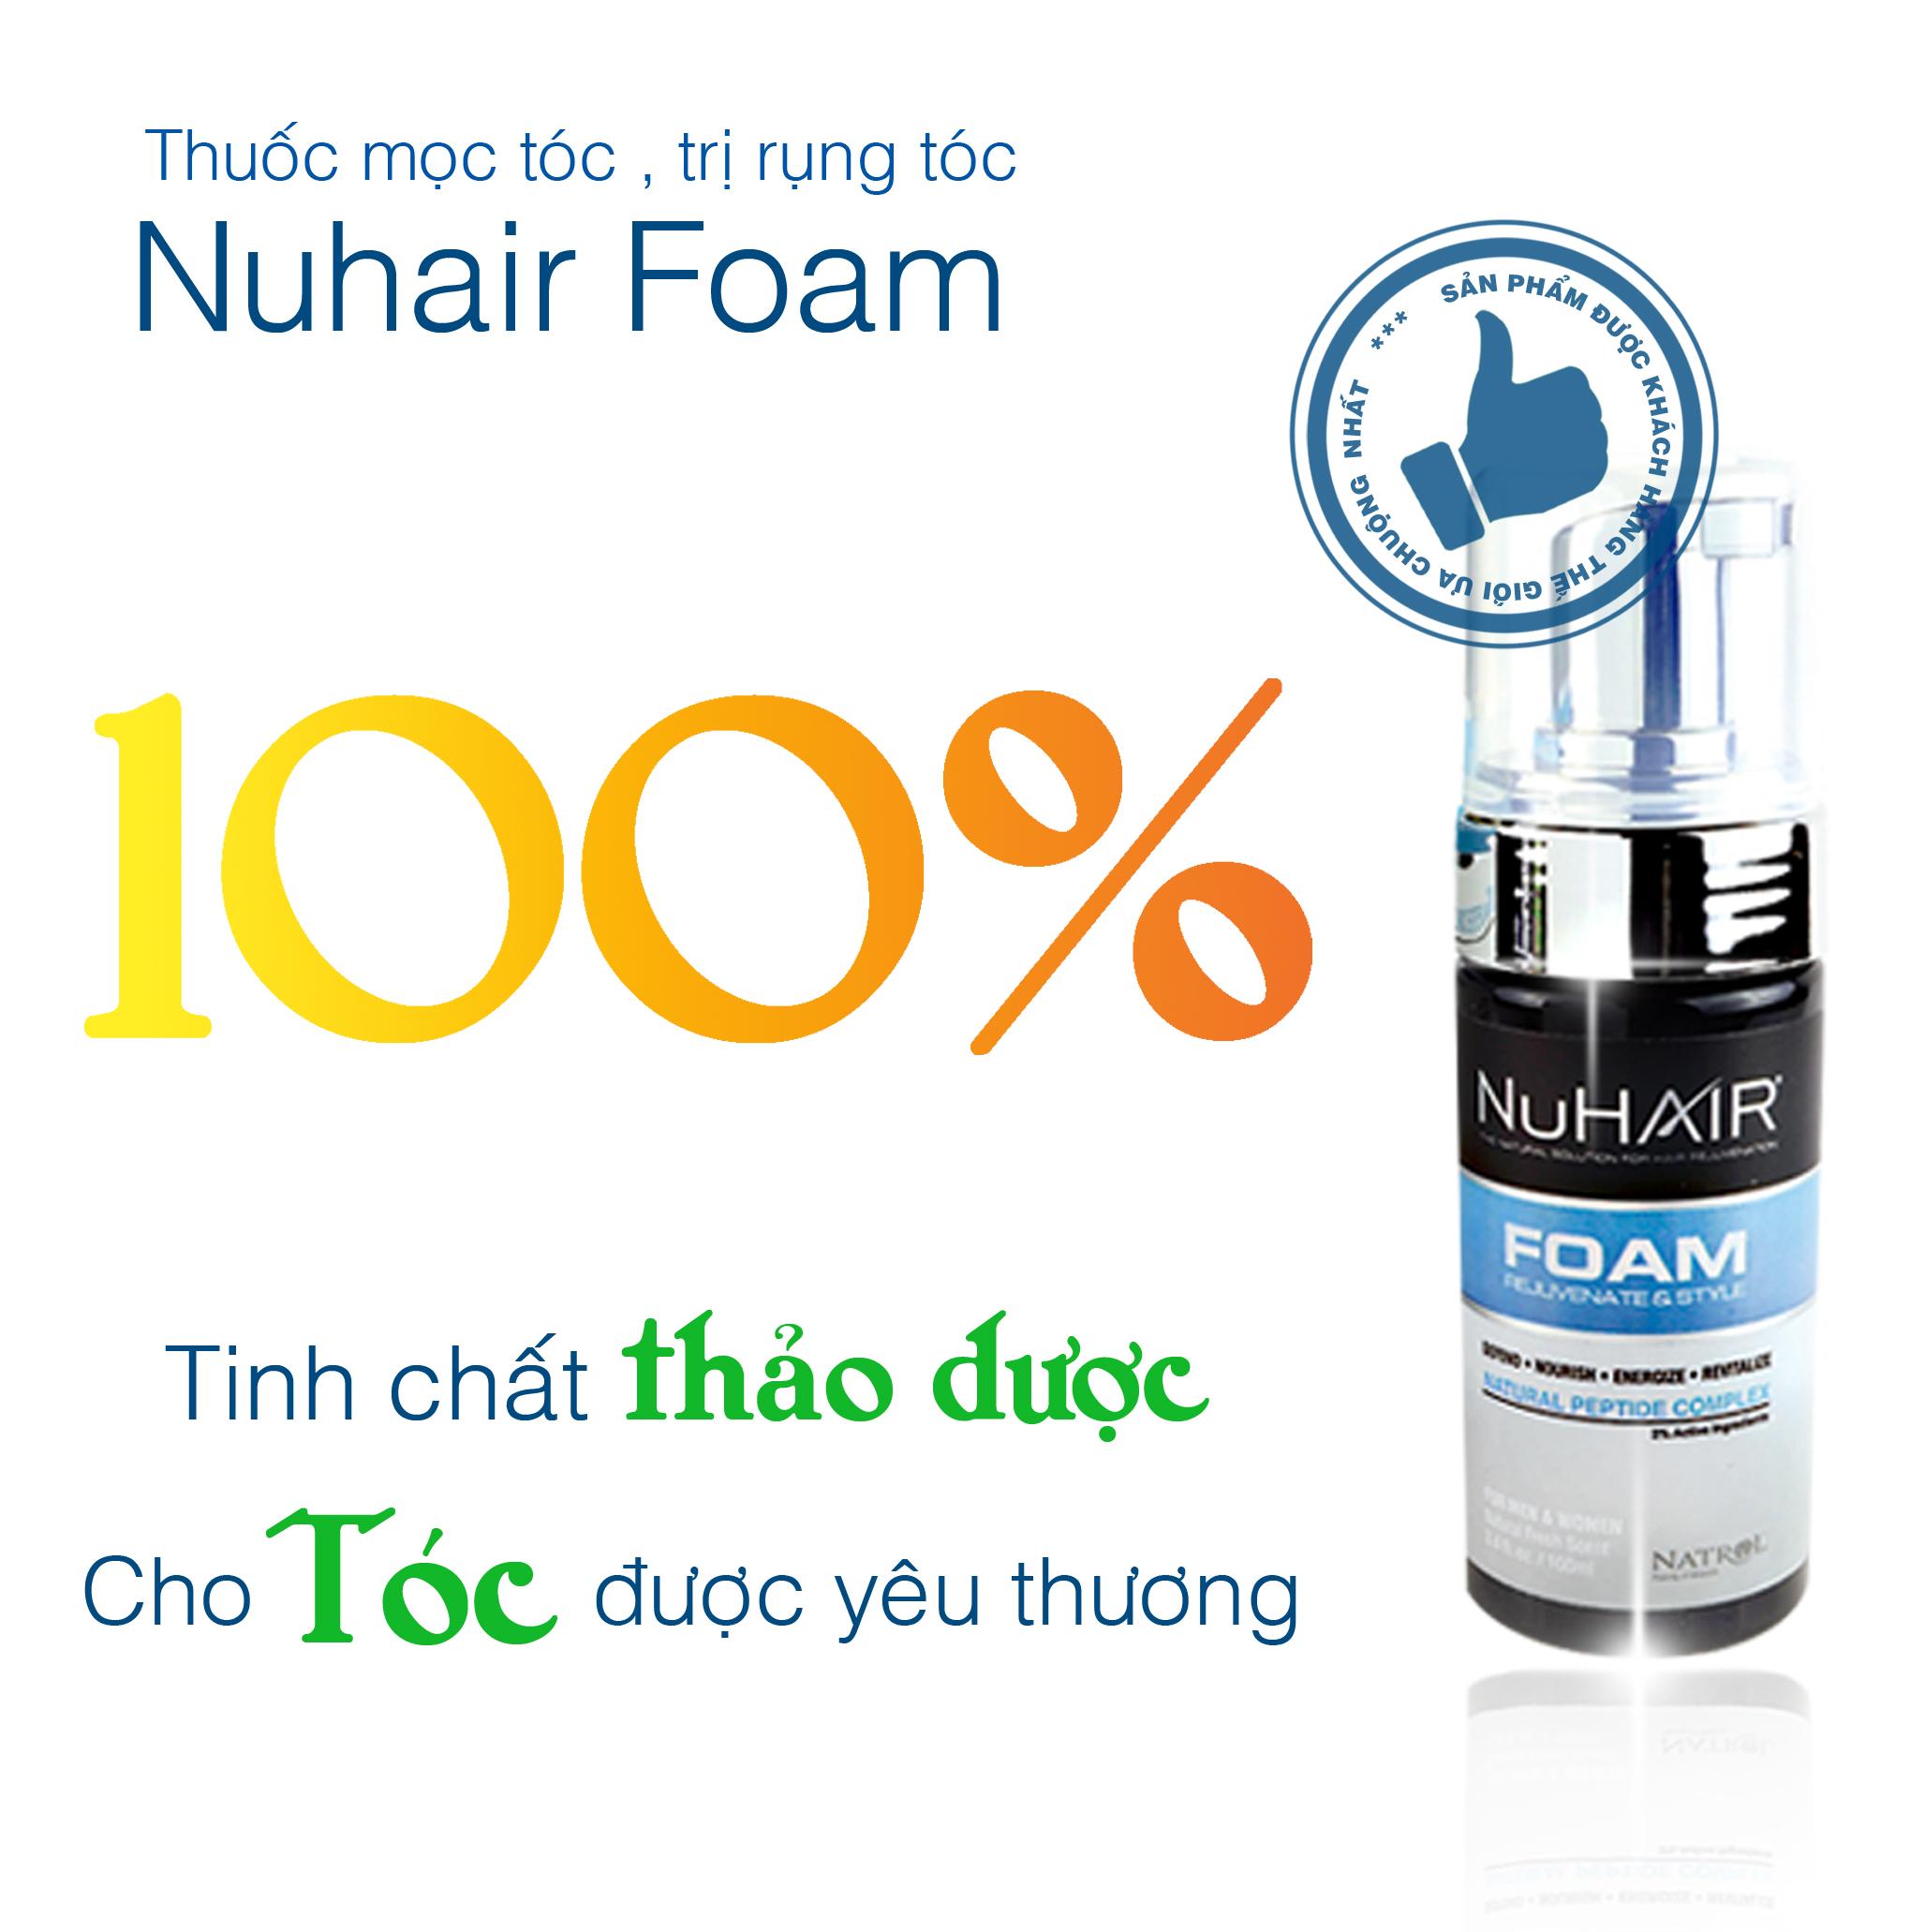 Thuốc Mọc Tóc NuHair